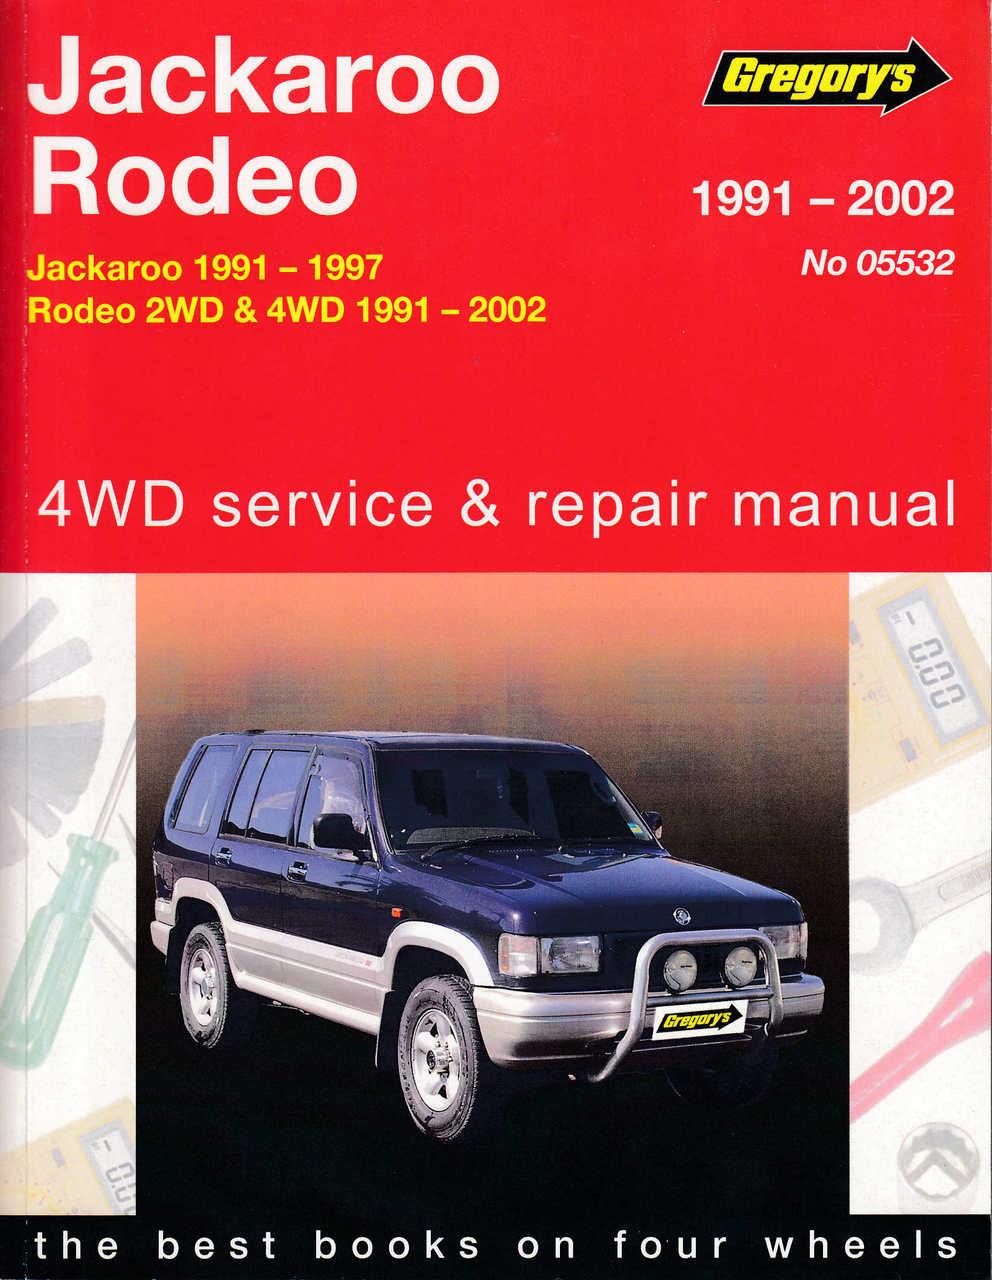 holden jackaroo and holden rodeo 1991 2002 workshop manual rh automotobookshop com au 1995 Holden Jackaroo workshop manual holden rodeo 1999